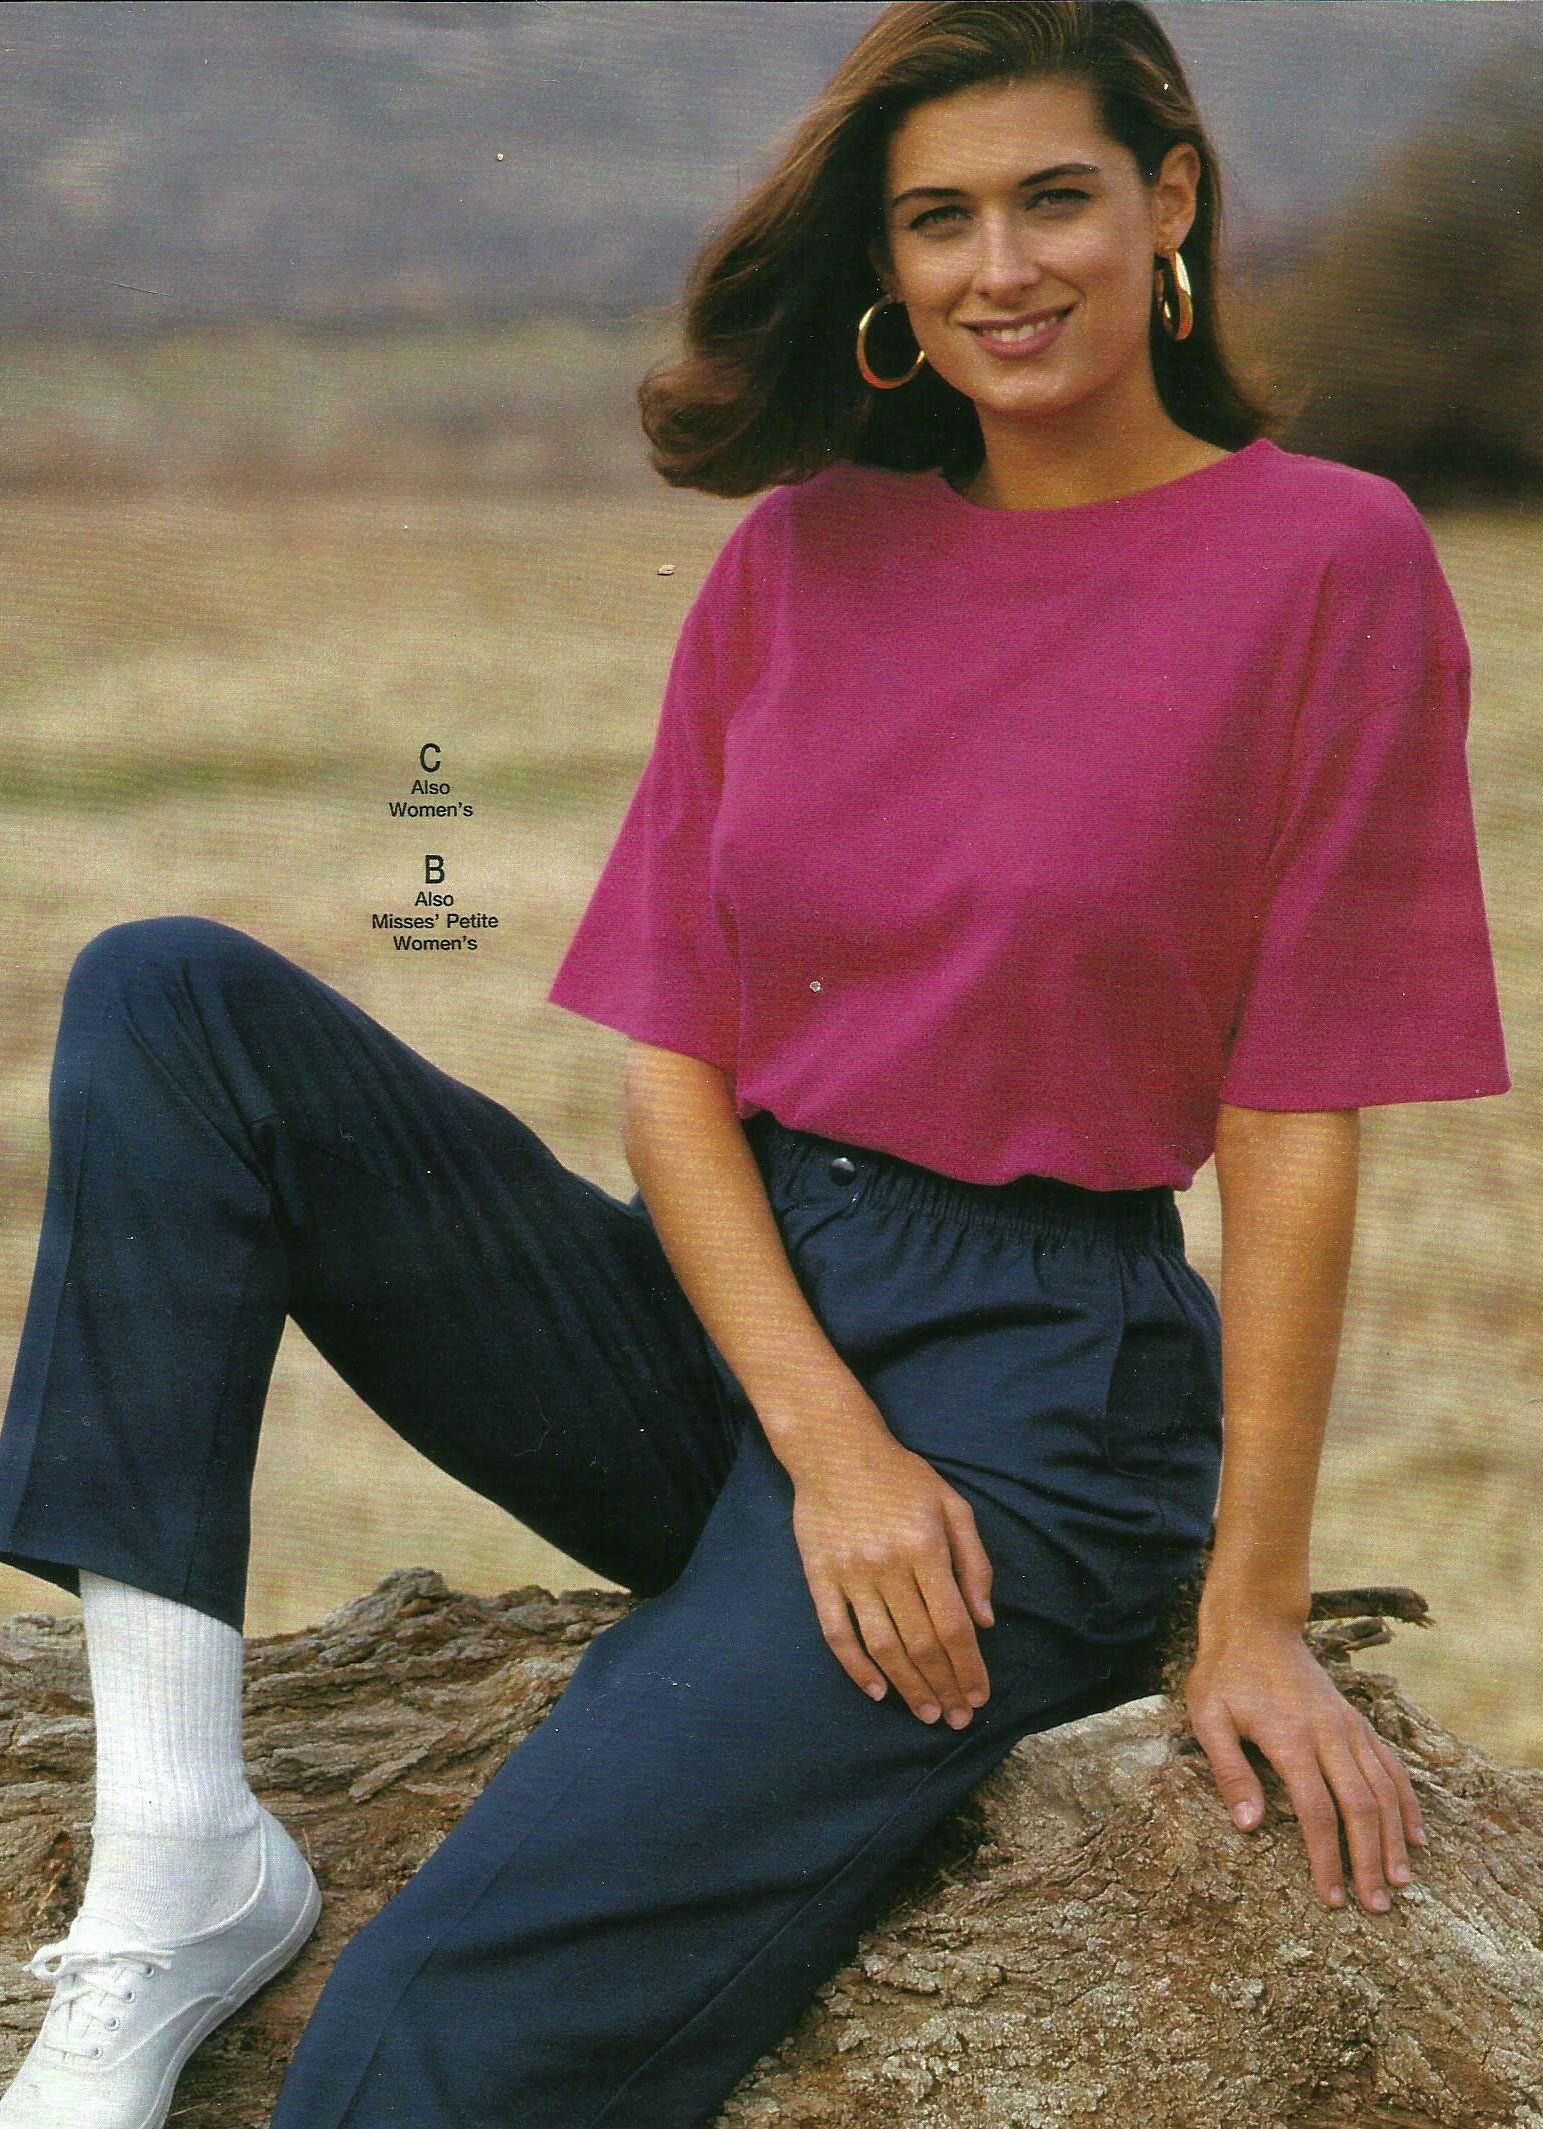 1990s Fashion for Women & Girls | 90s Fashion Trends ...